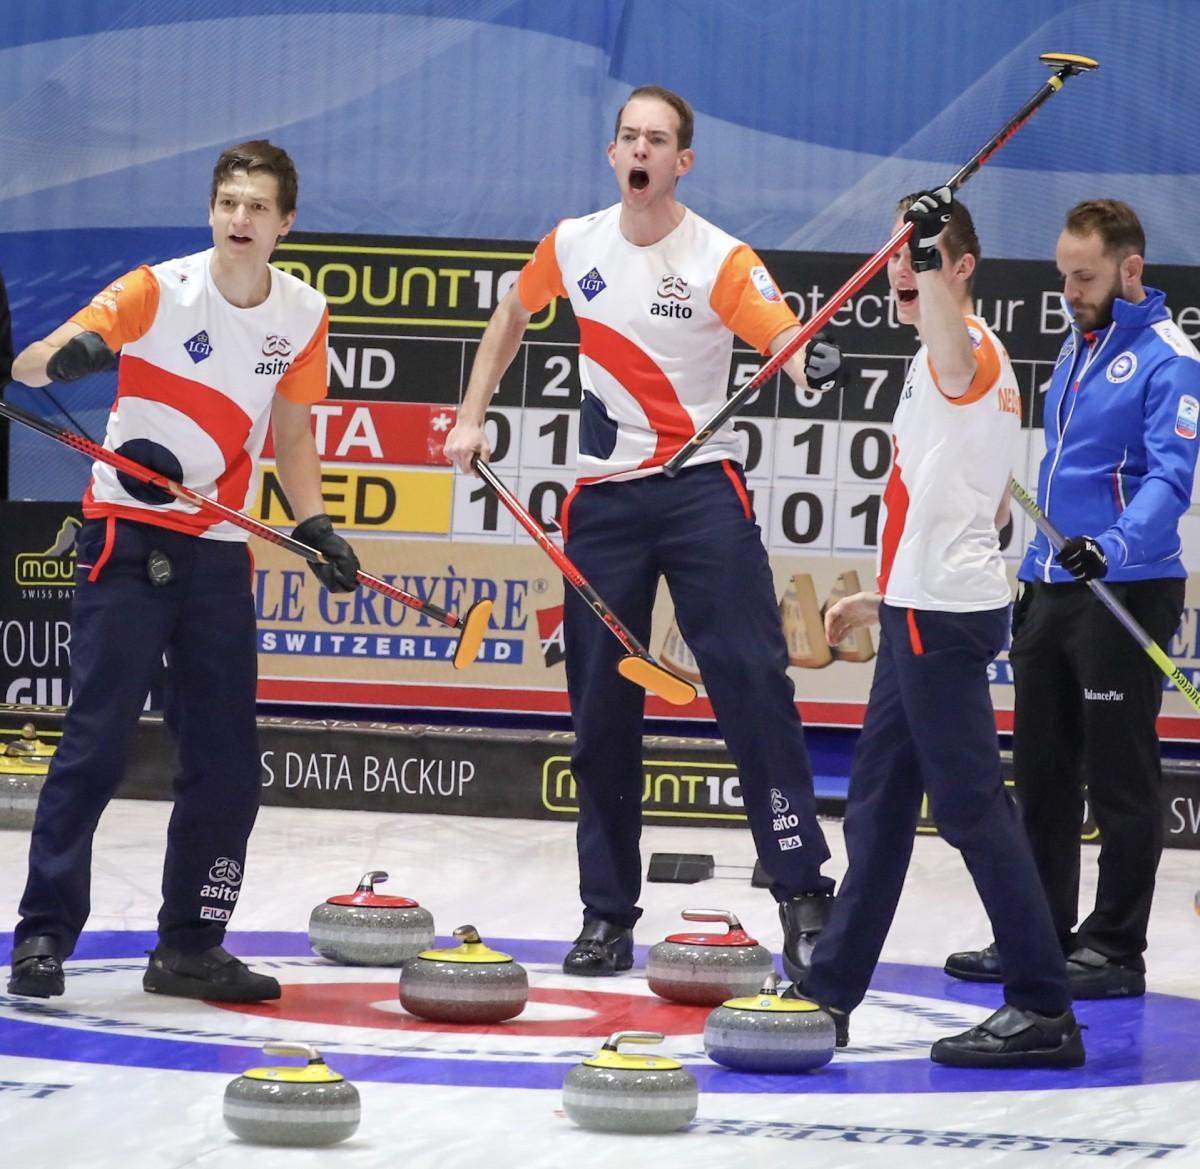 Netherlands won their first men's worlds berth at the 2017 Euros • Richard Gray-WCF